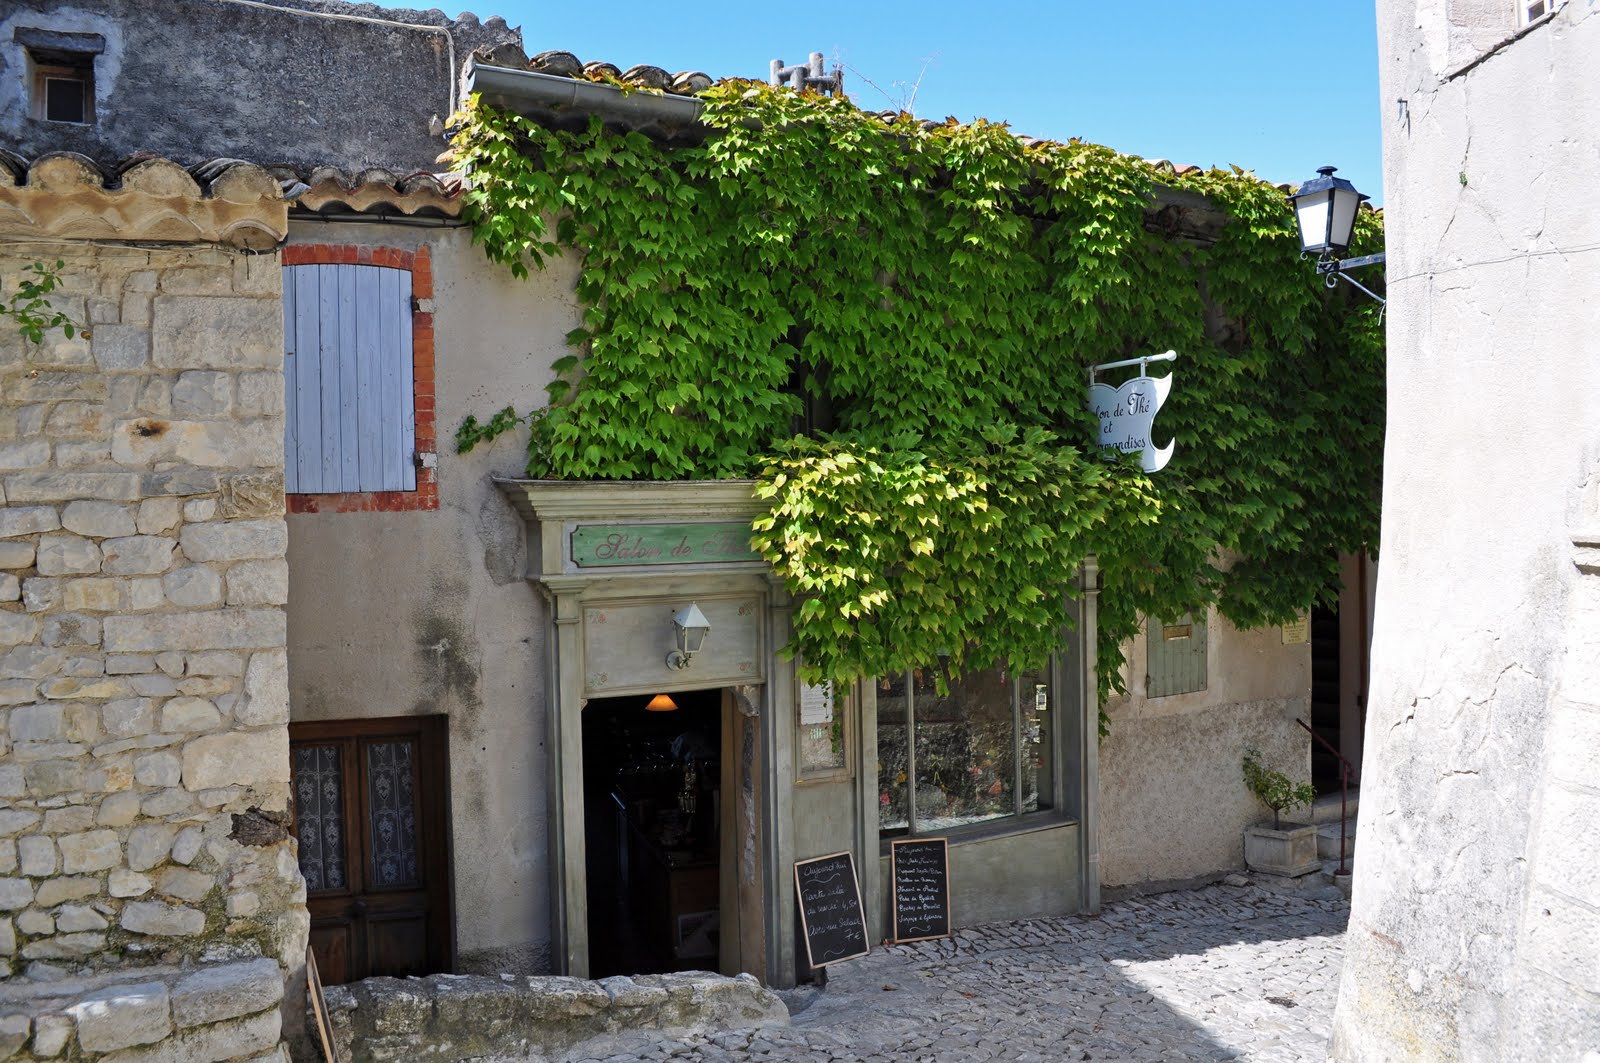 Sud musique salon de provence for Ifte sud salon de provence avis